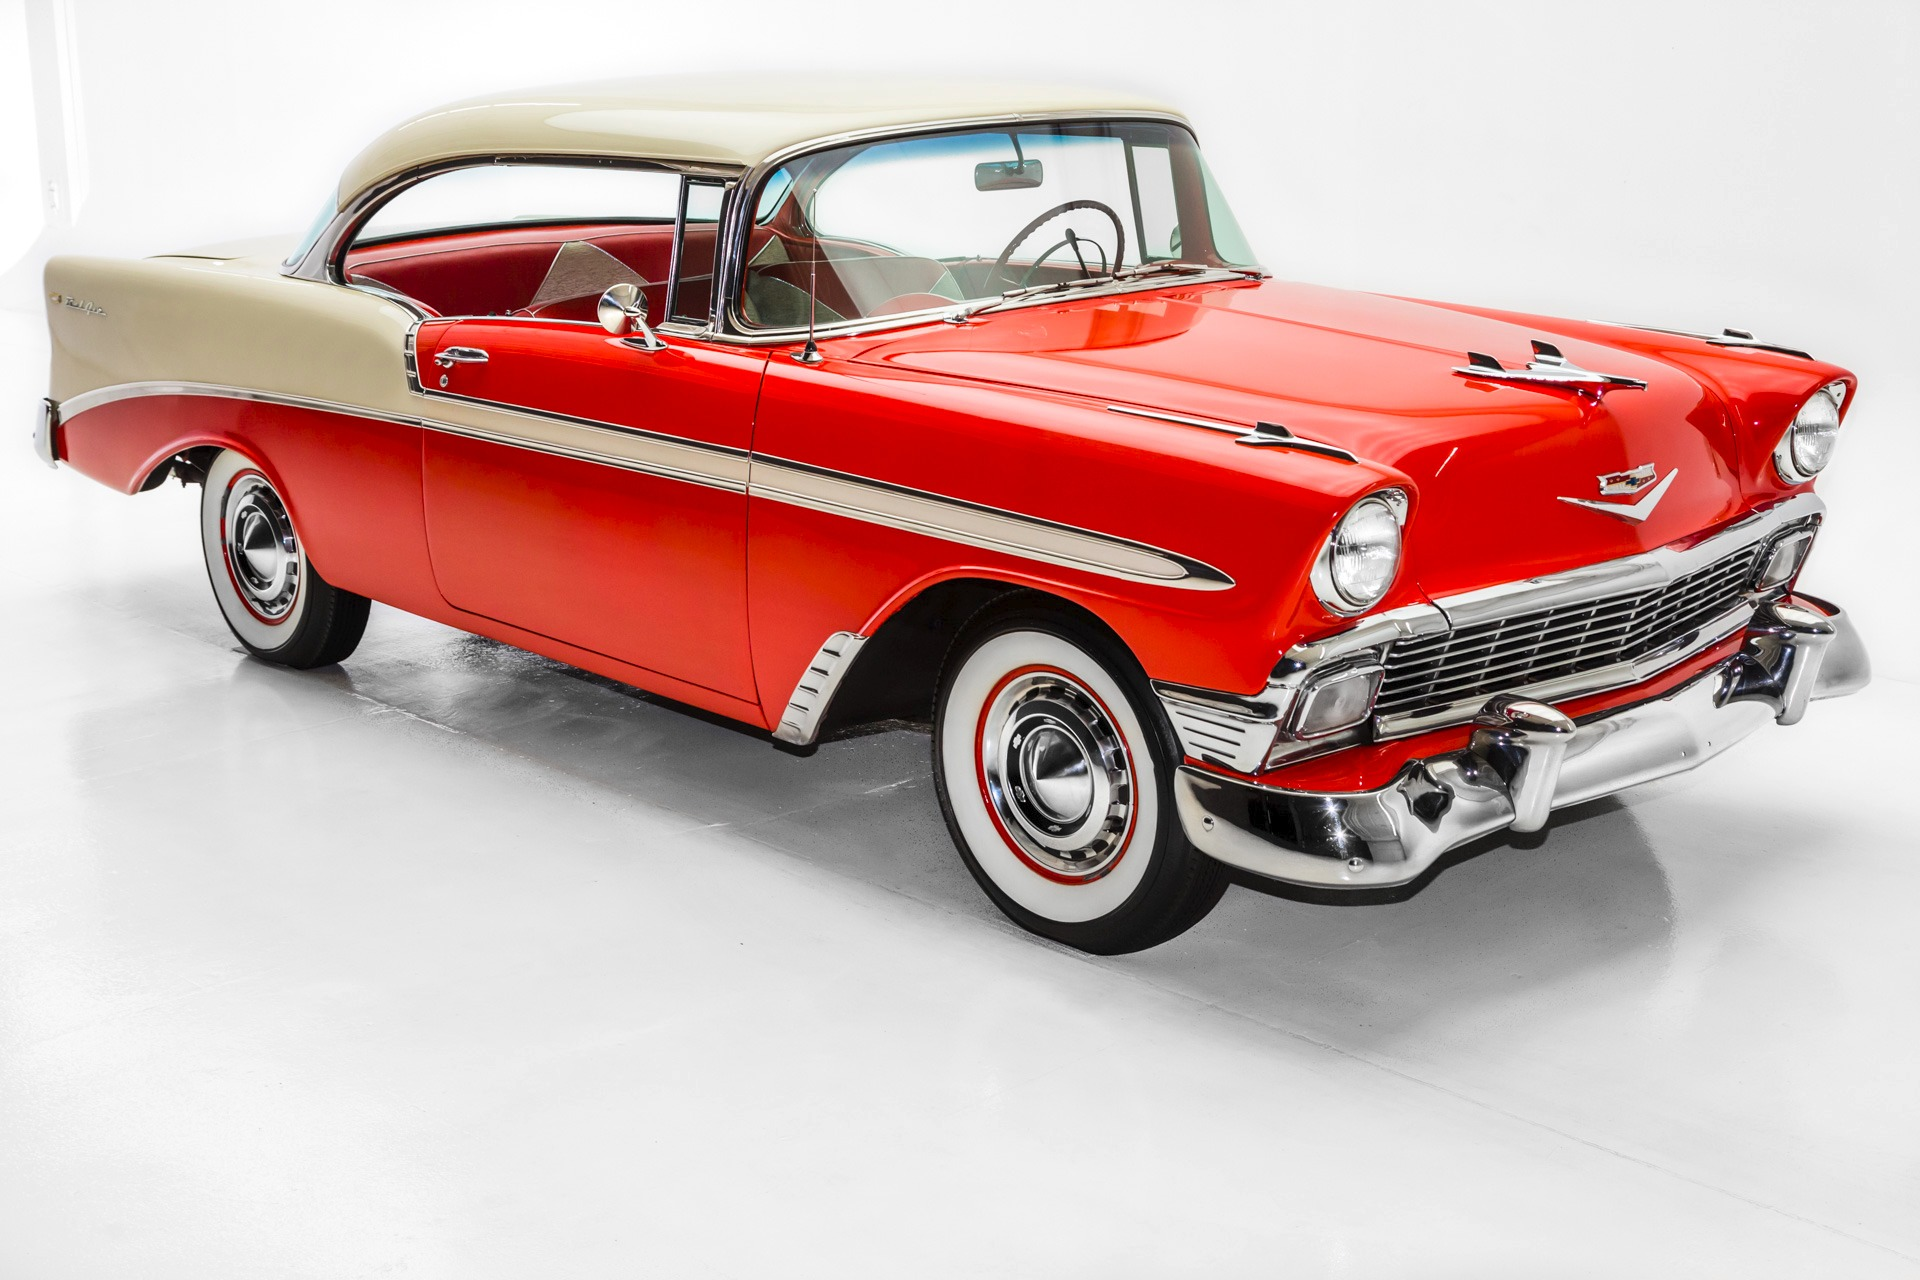 1956 chevrolet bel air v8 auto amazing car american